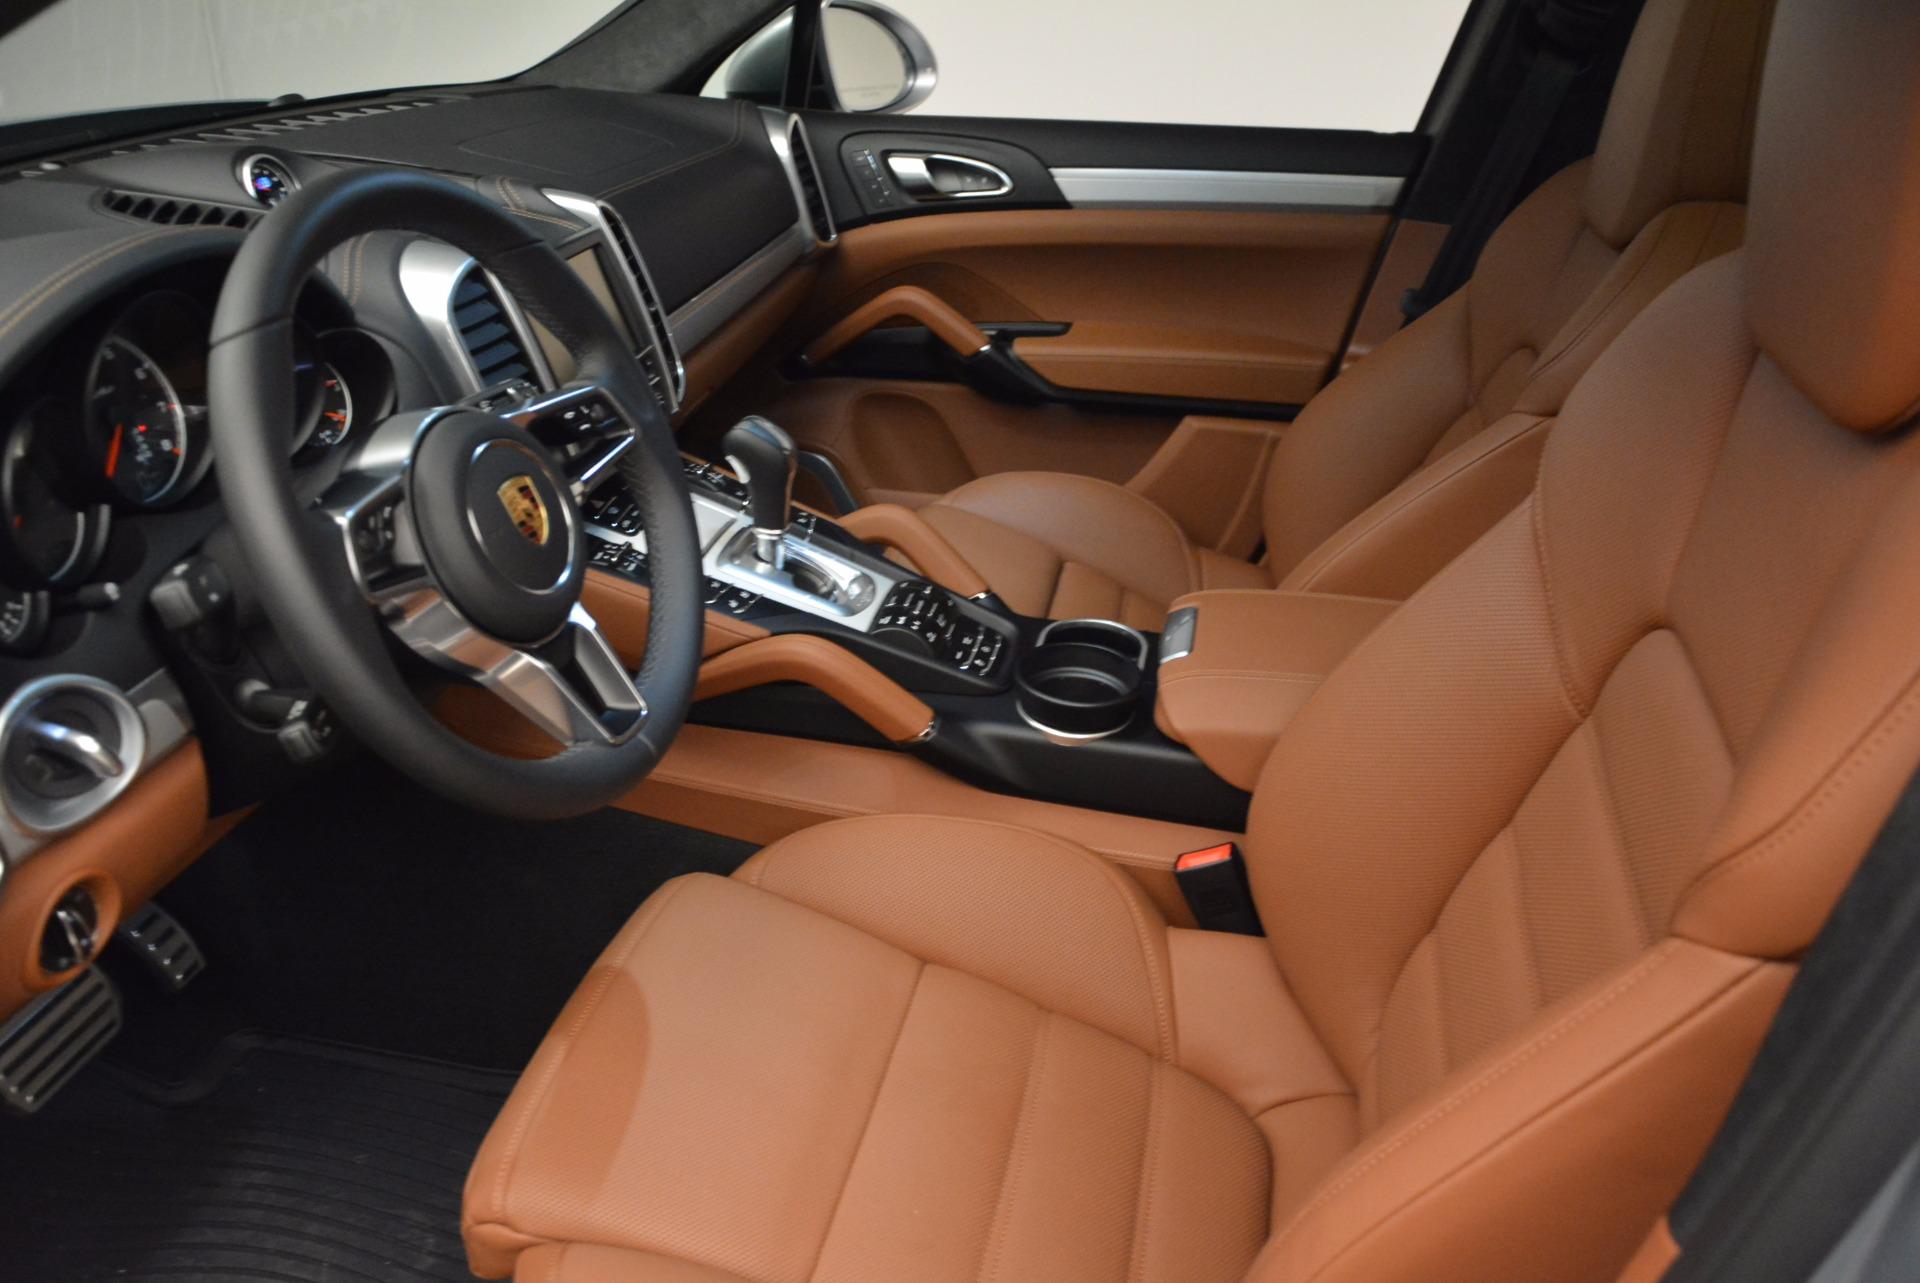 Used 2016 Porsche Cayenne Turbo For Sale In Westport, CT 1000_p20